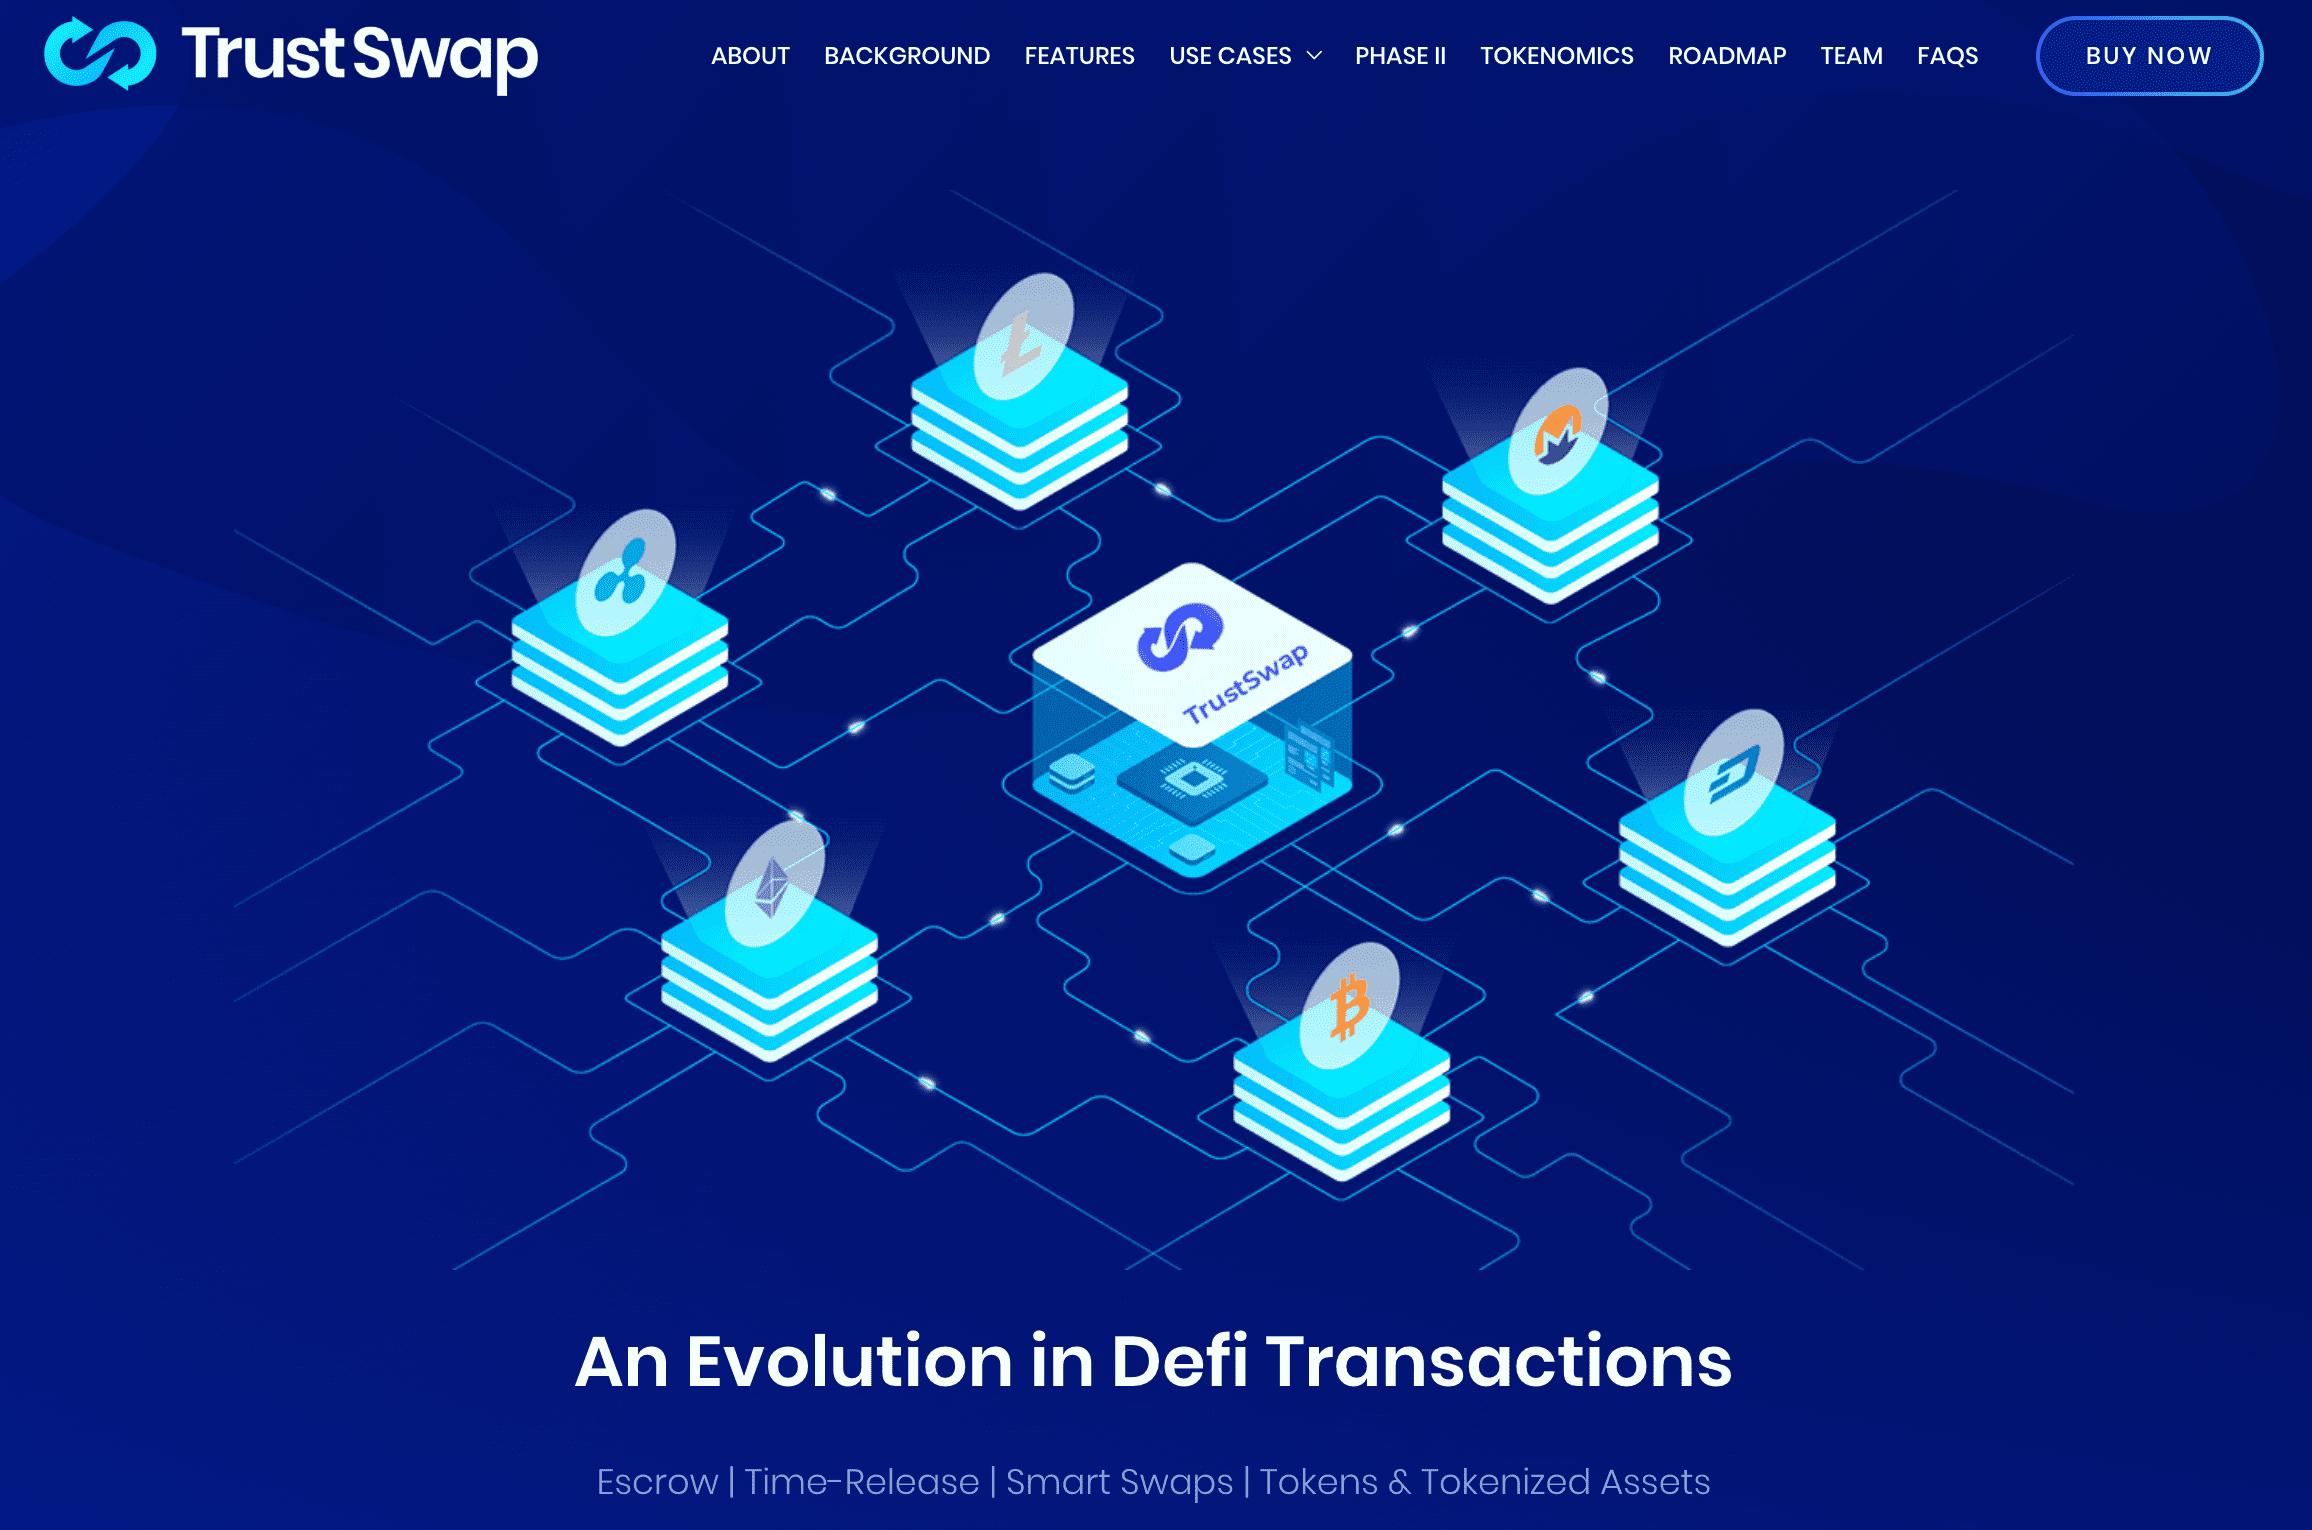 trustswap defi transactions